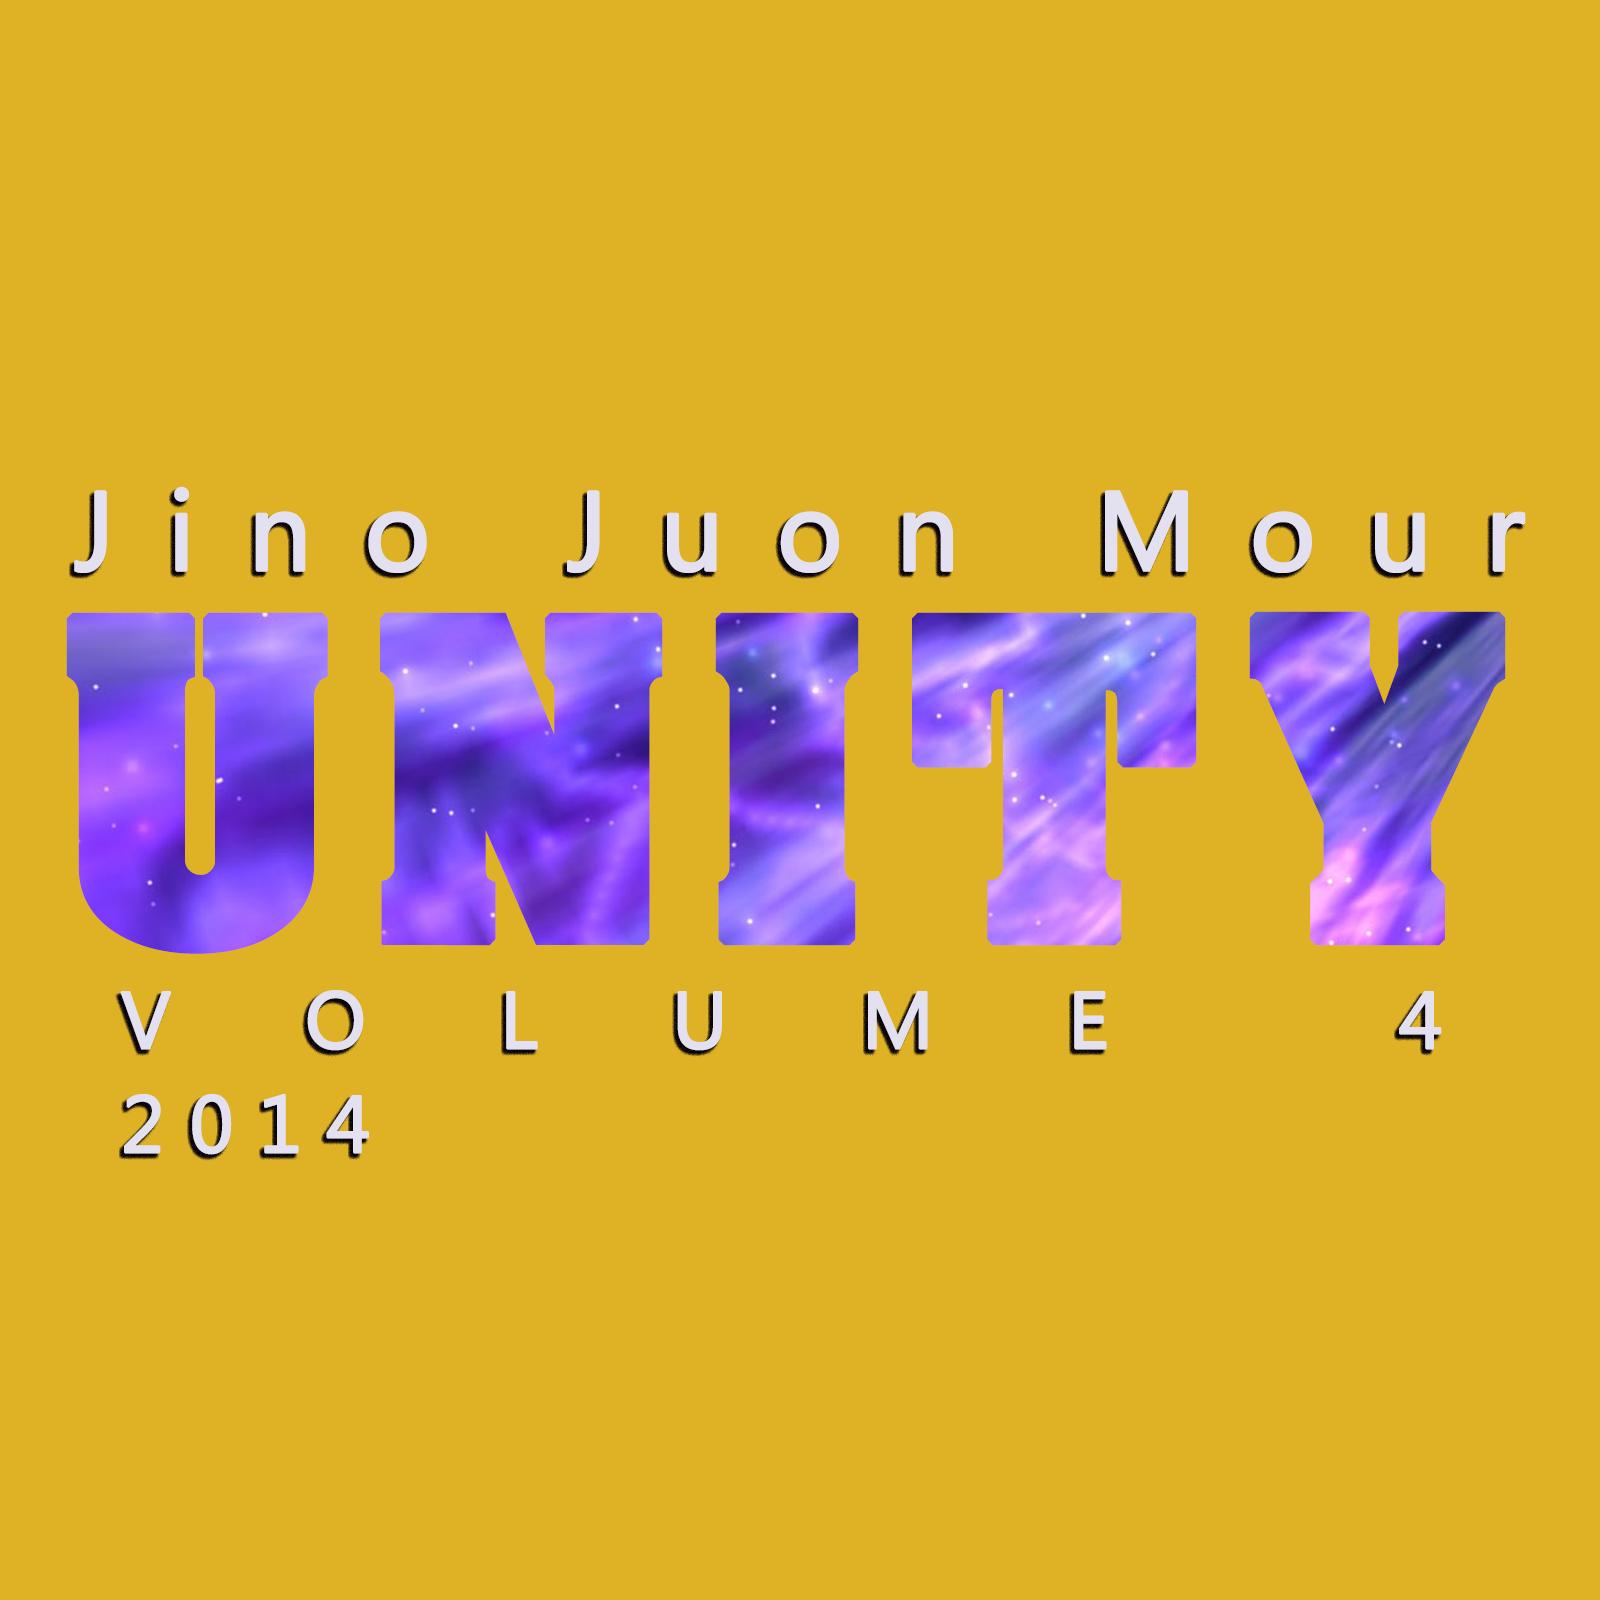 Art for Inaj Bed Iben Jema Ijo Ilan by Unity Vol 4